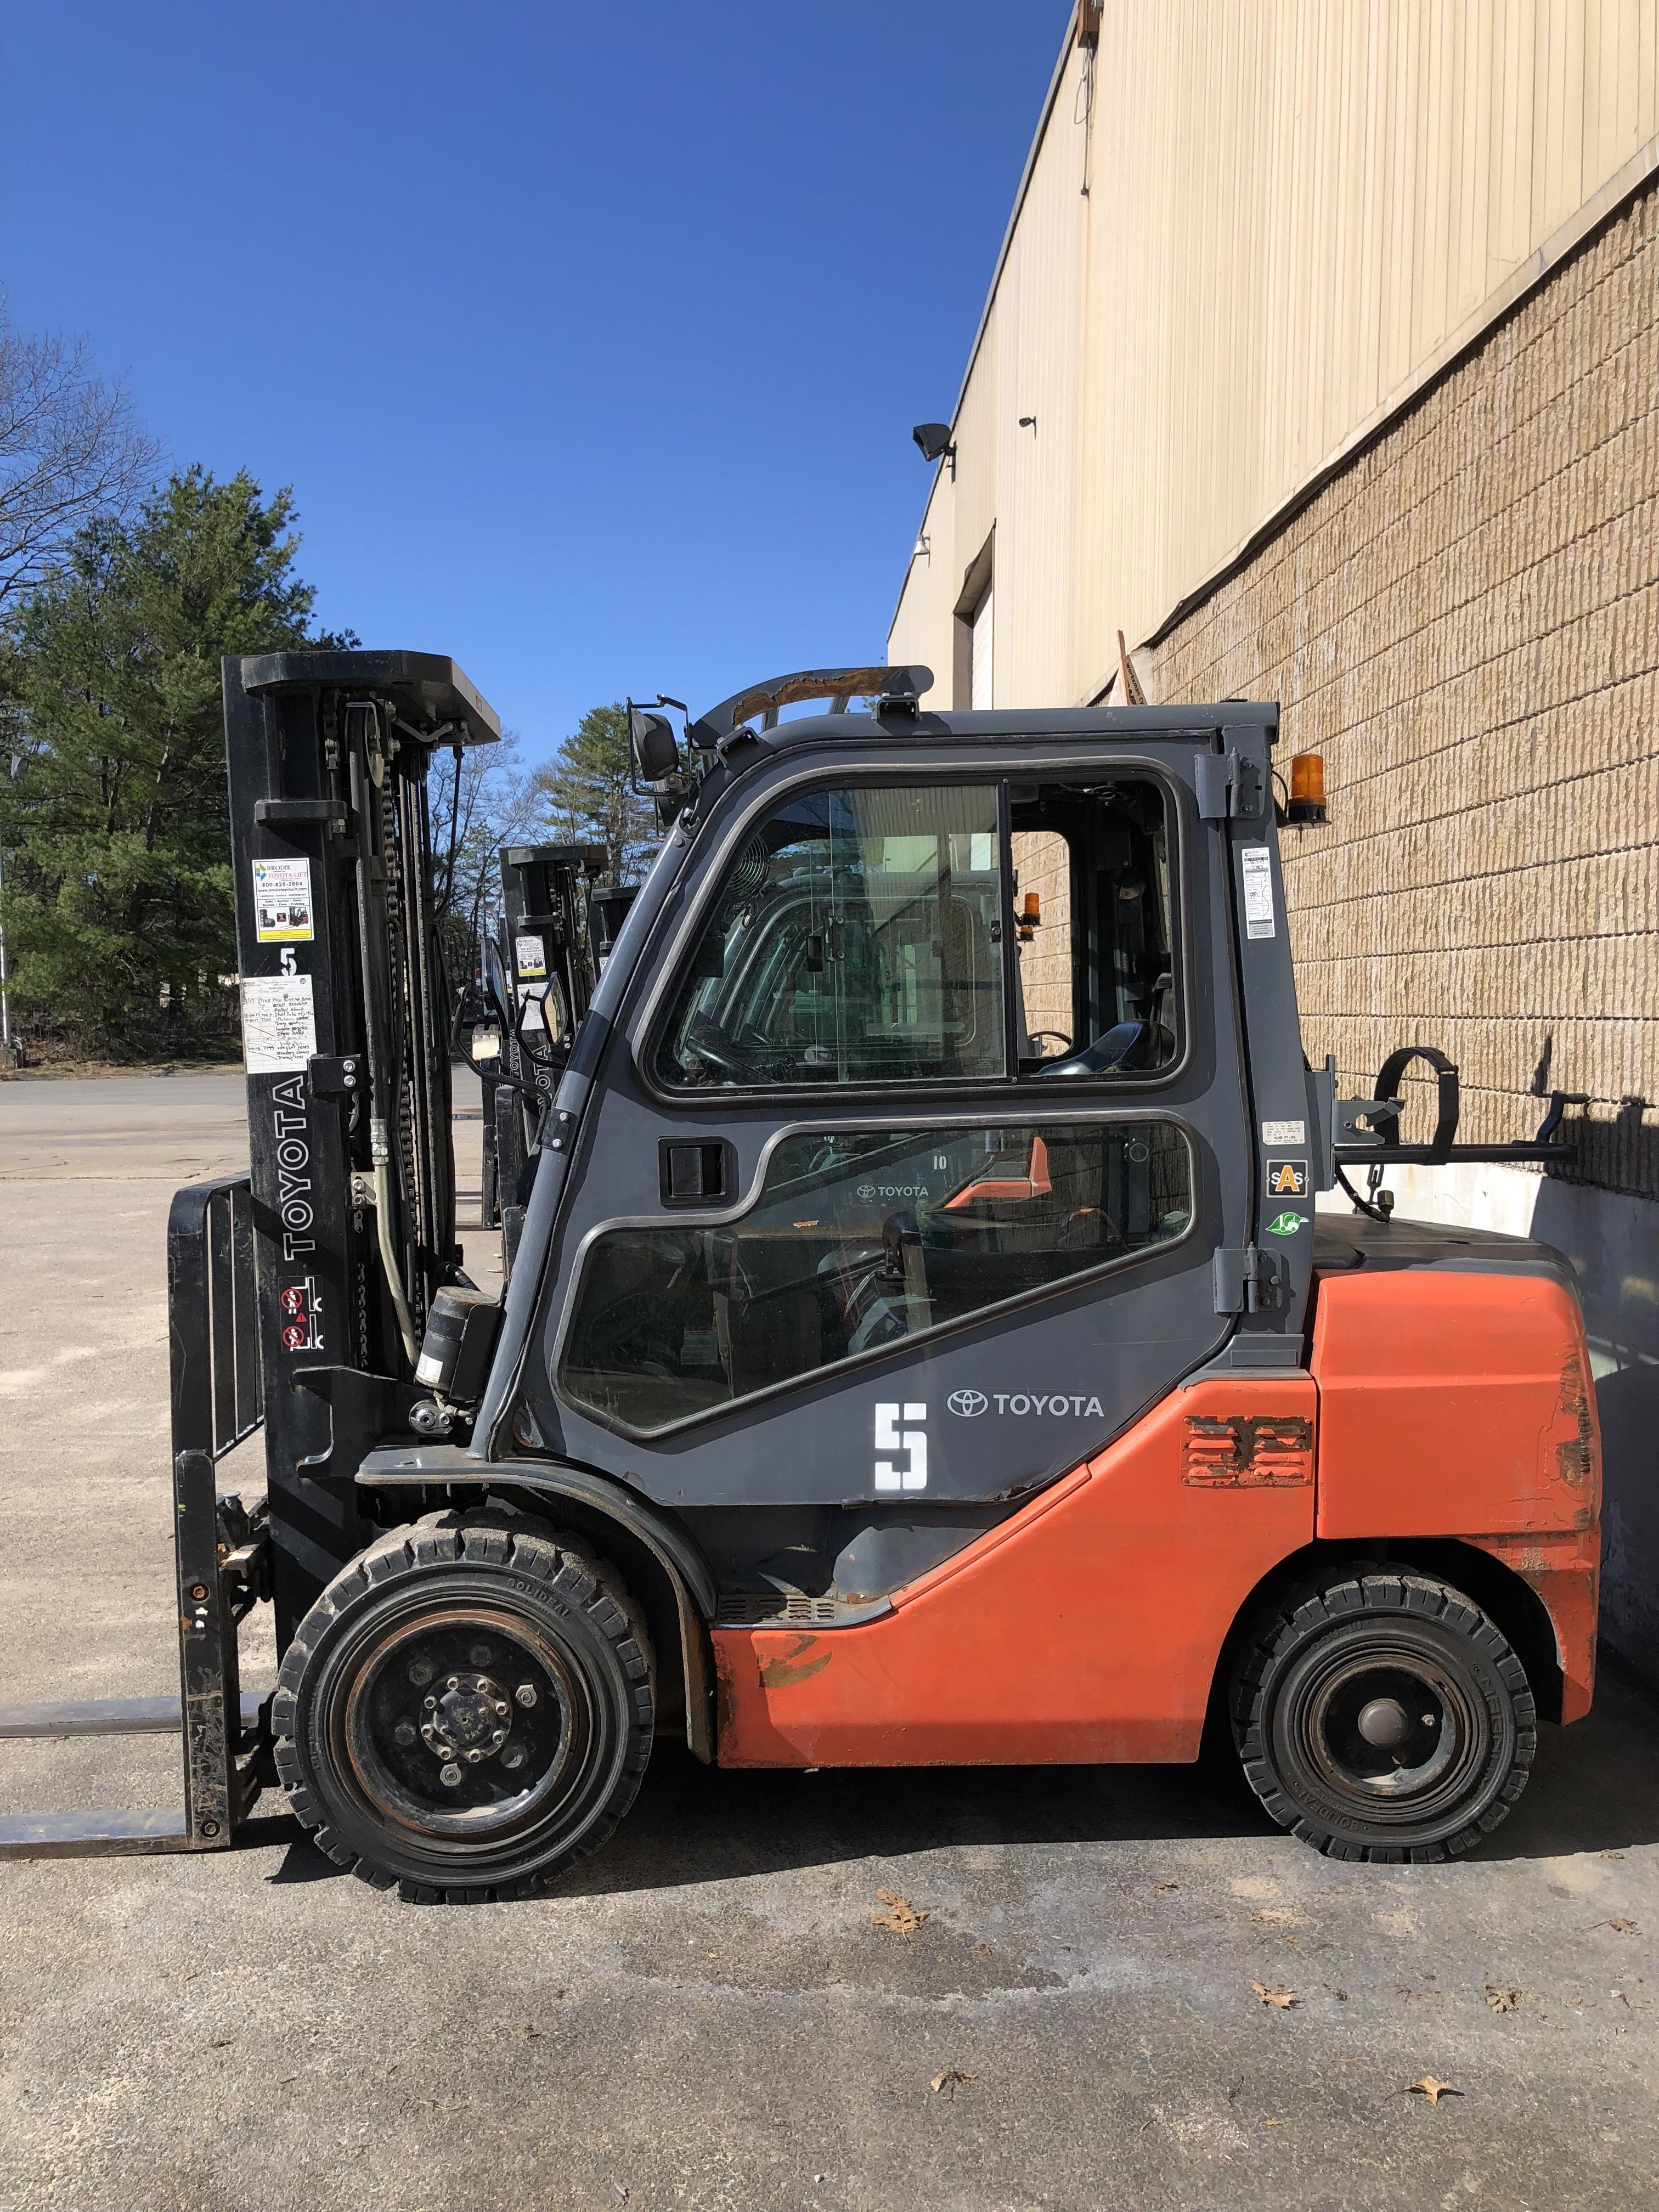 Used, 2011, Toyota Industrial Equipment, 8FGU30, Forklifts / Lift Trucks